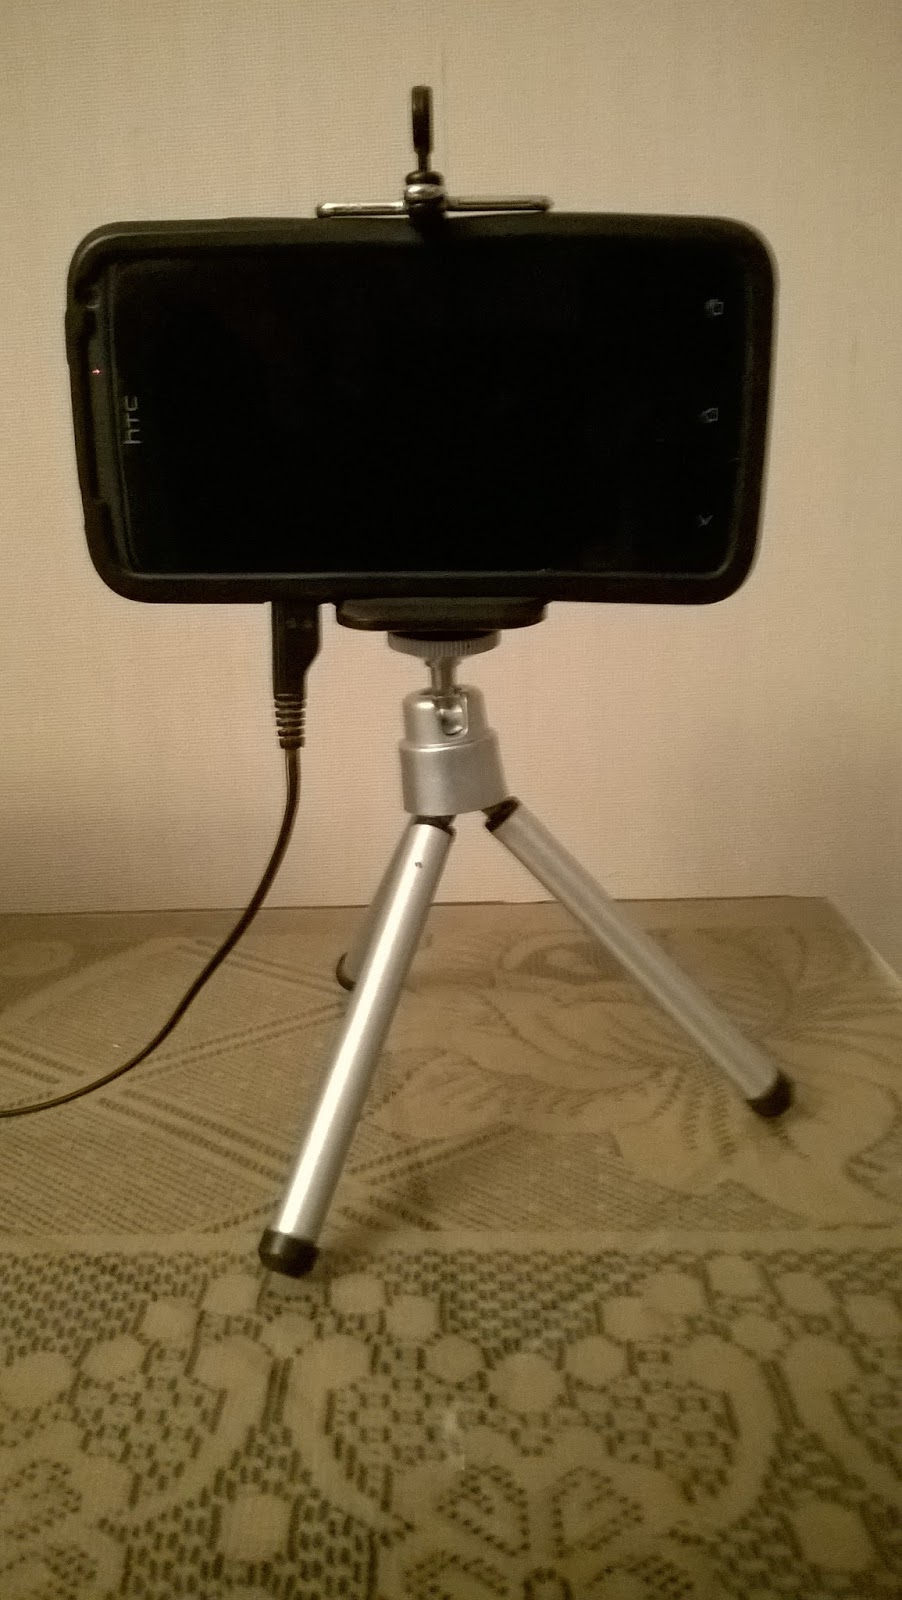 Gadget गुरू's Mouthpiece: Home Video Surveillance